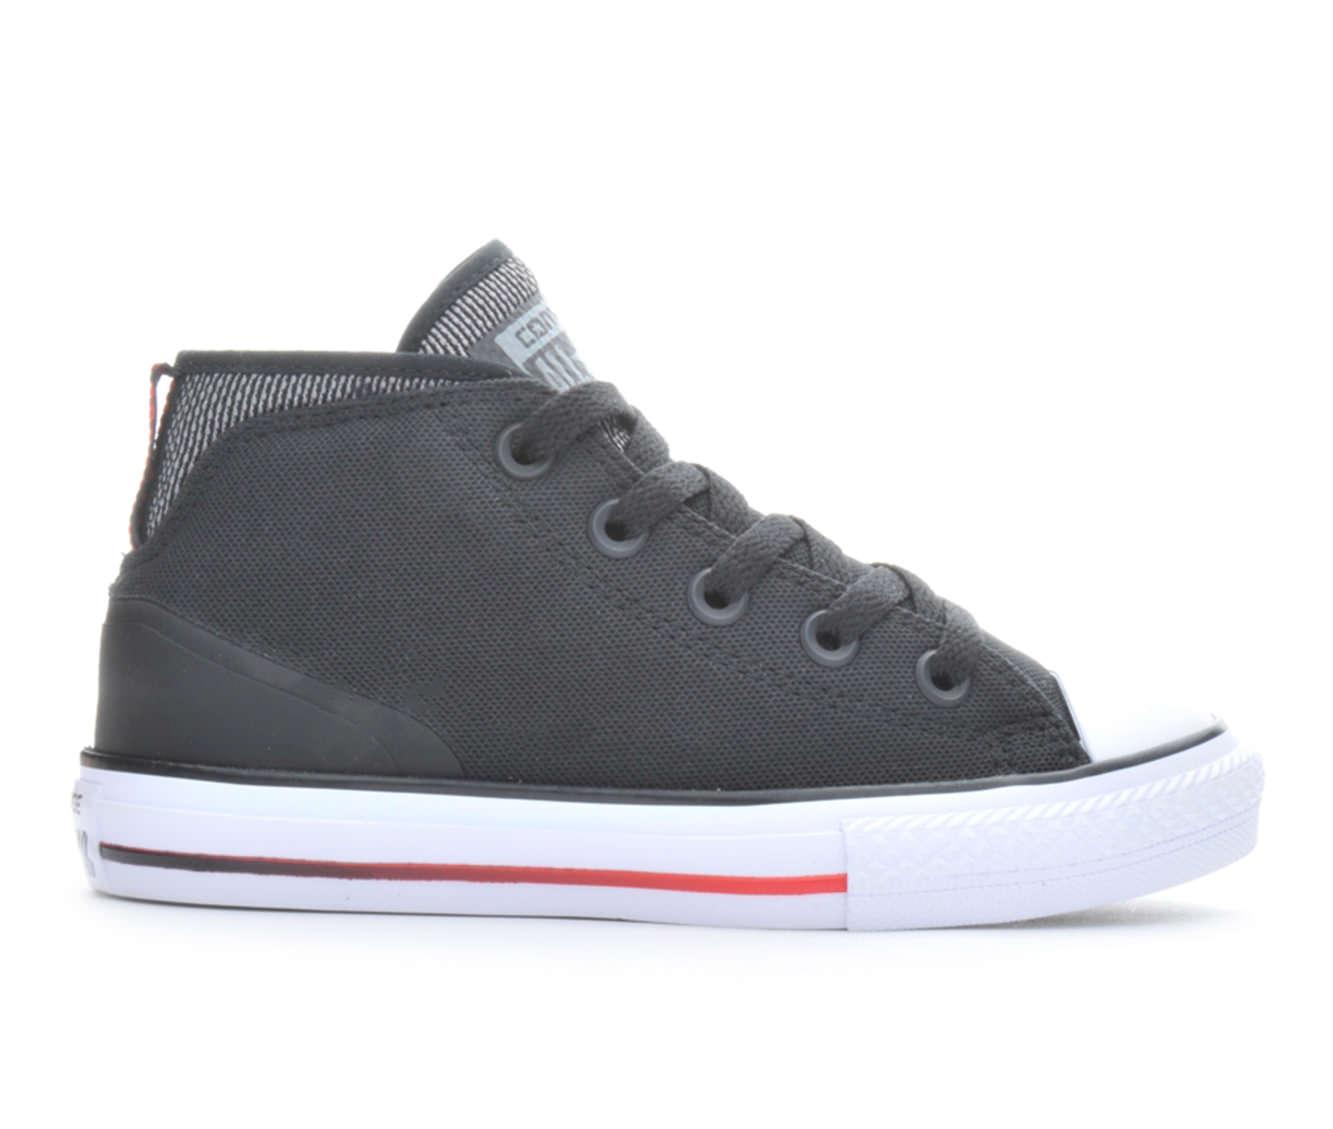 Boys' Converse Syde Street Summer Canvas Sneakers (Black)